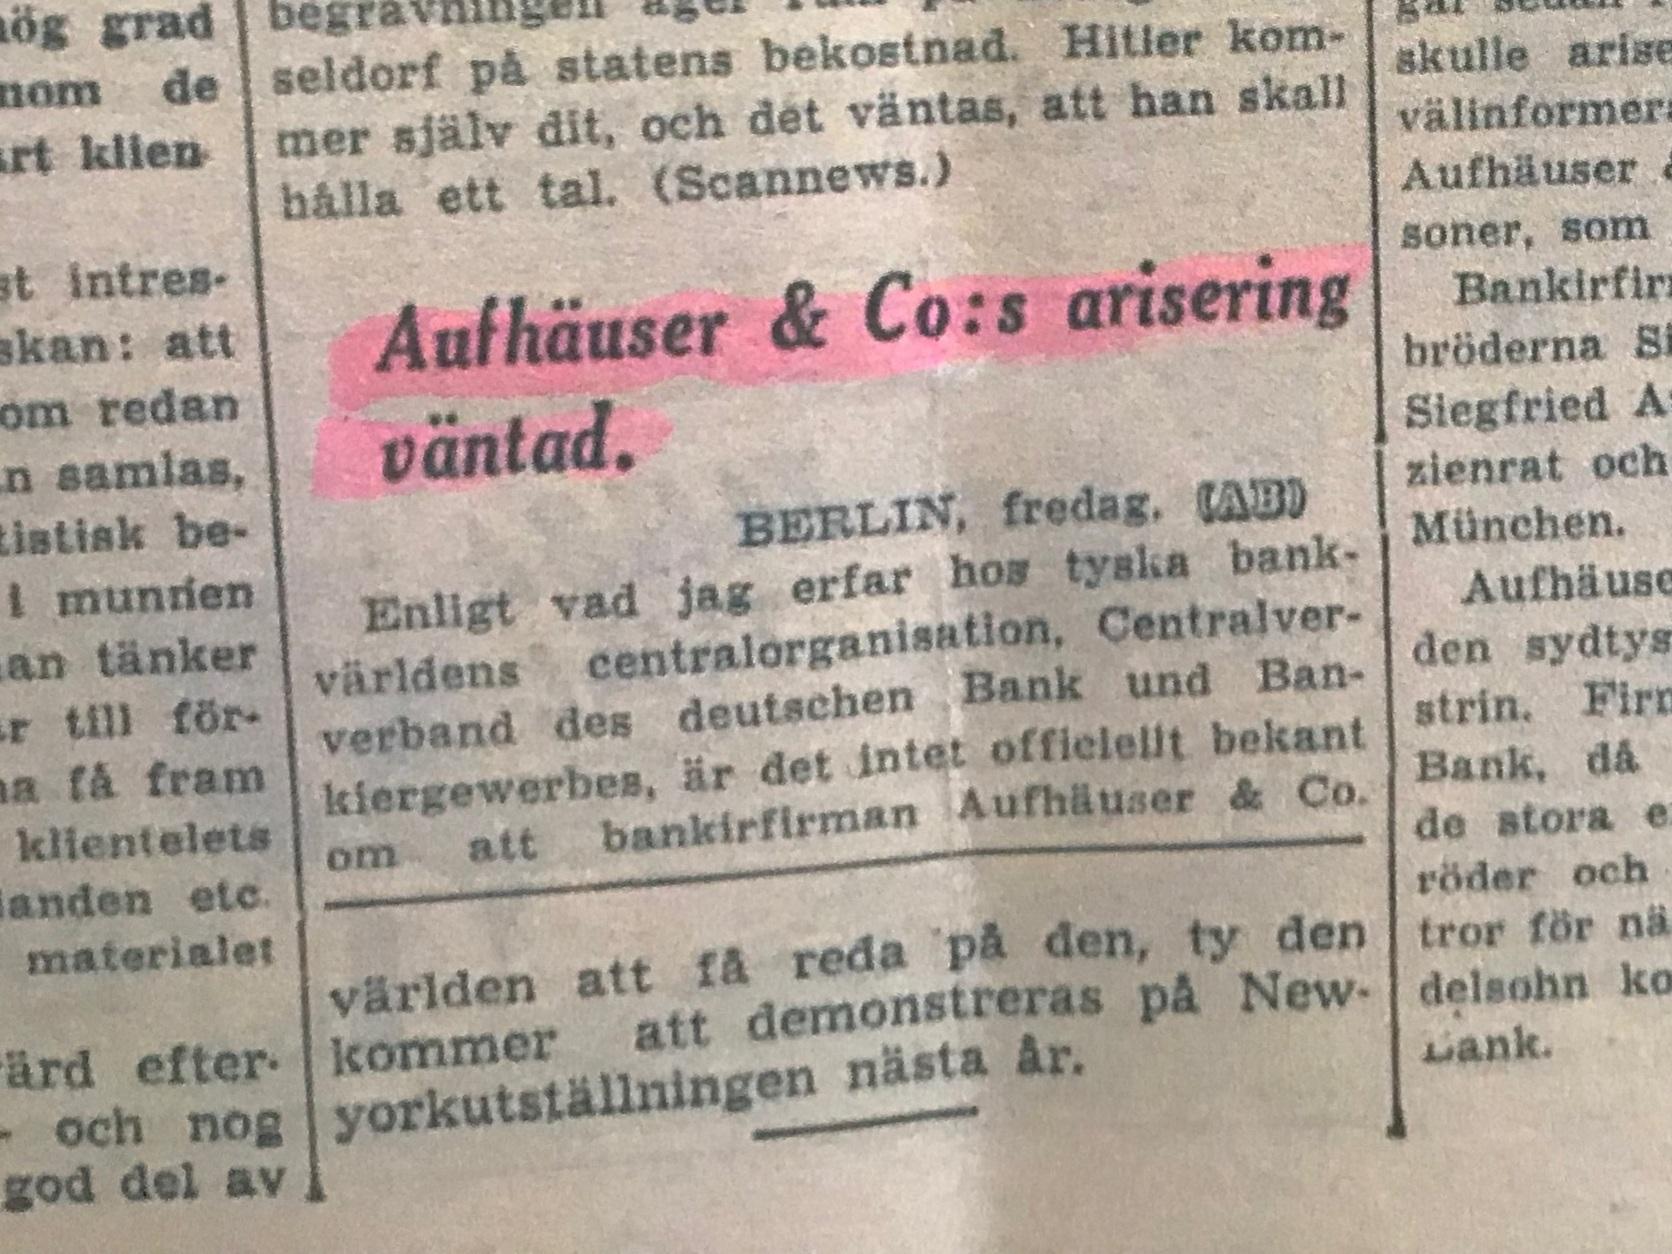 Aftonbladet fredagen den 11:e november 1938 sid 18